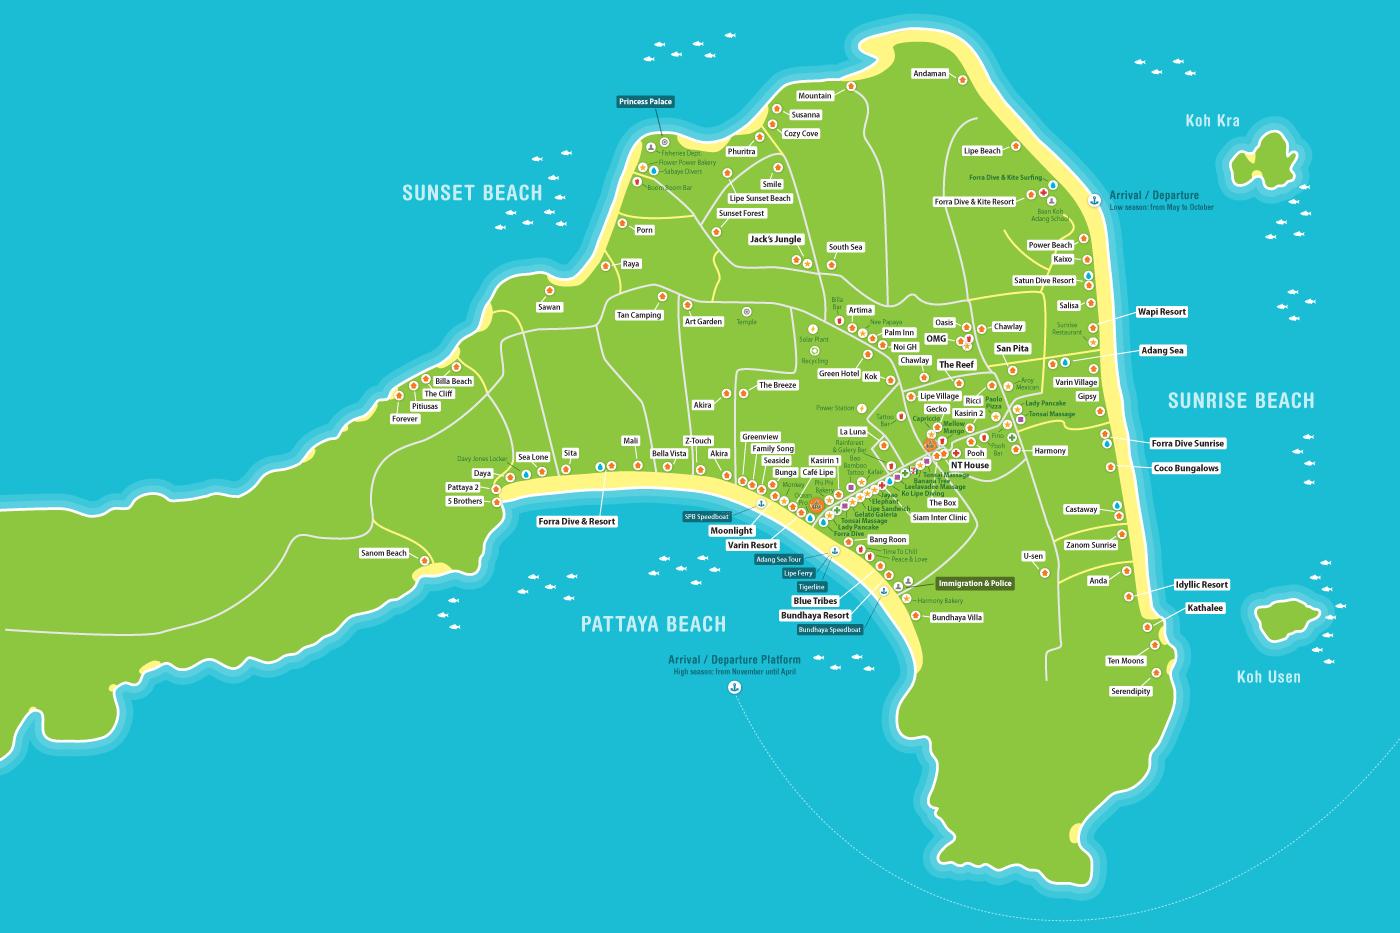 mapa kph lepe tailandia